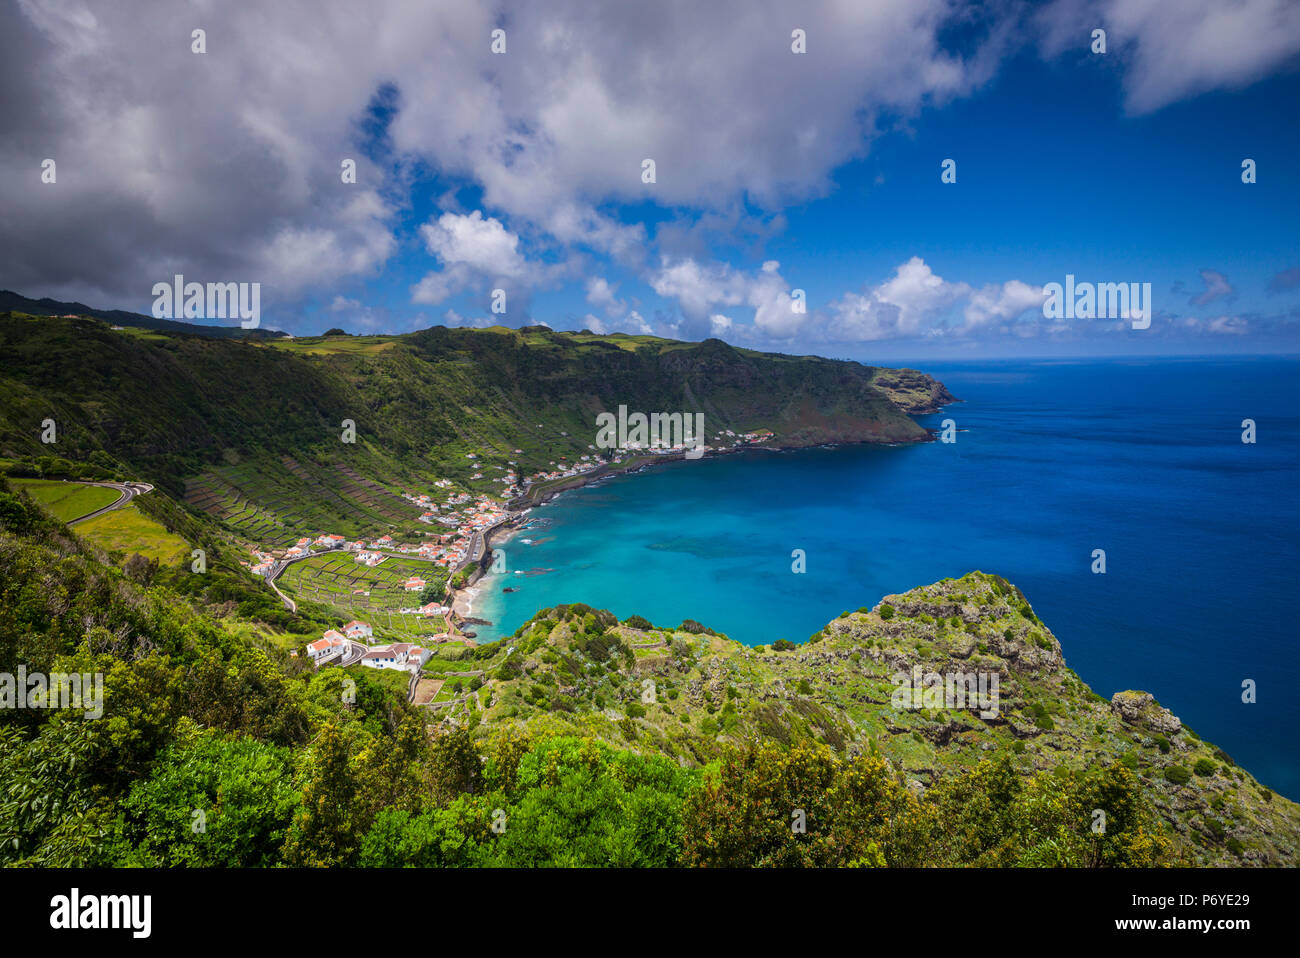 Portugal, Azores, Santa Maria Island, Sao Lourenco with the Baia do Sao Lourenco bay - Stock Image